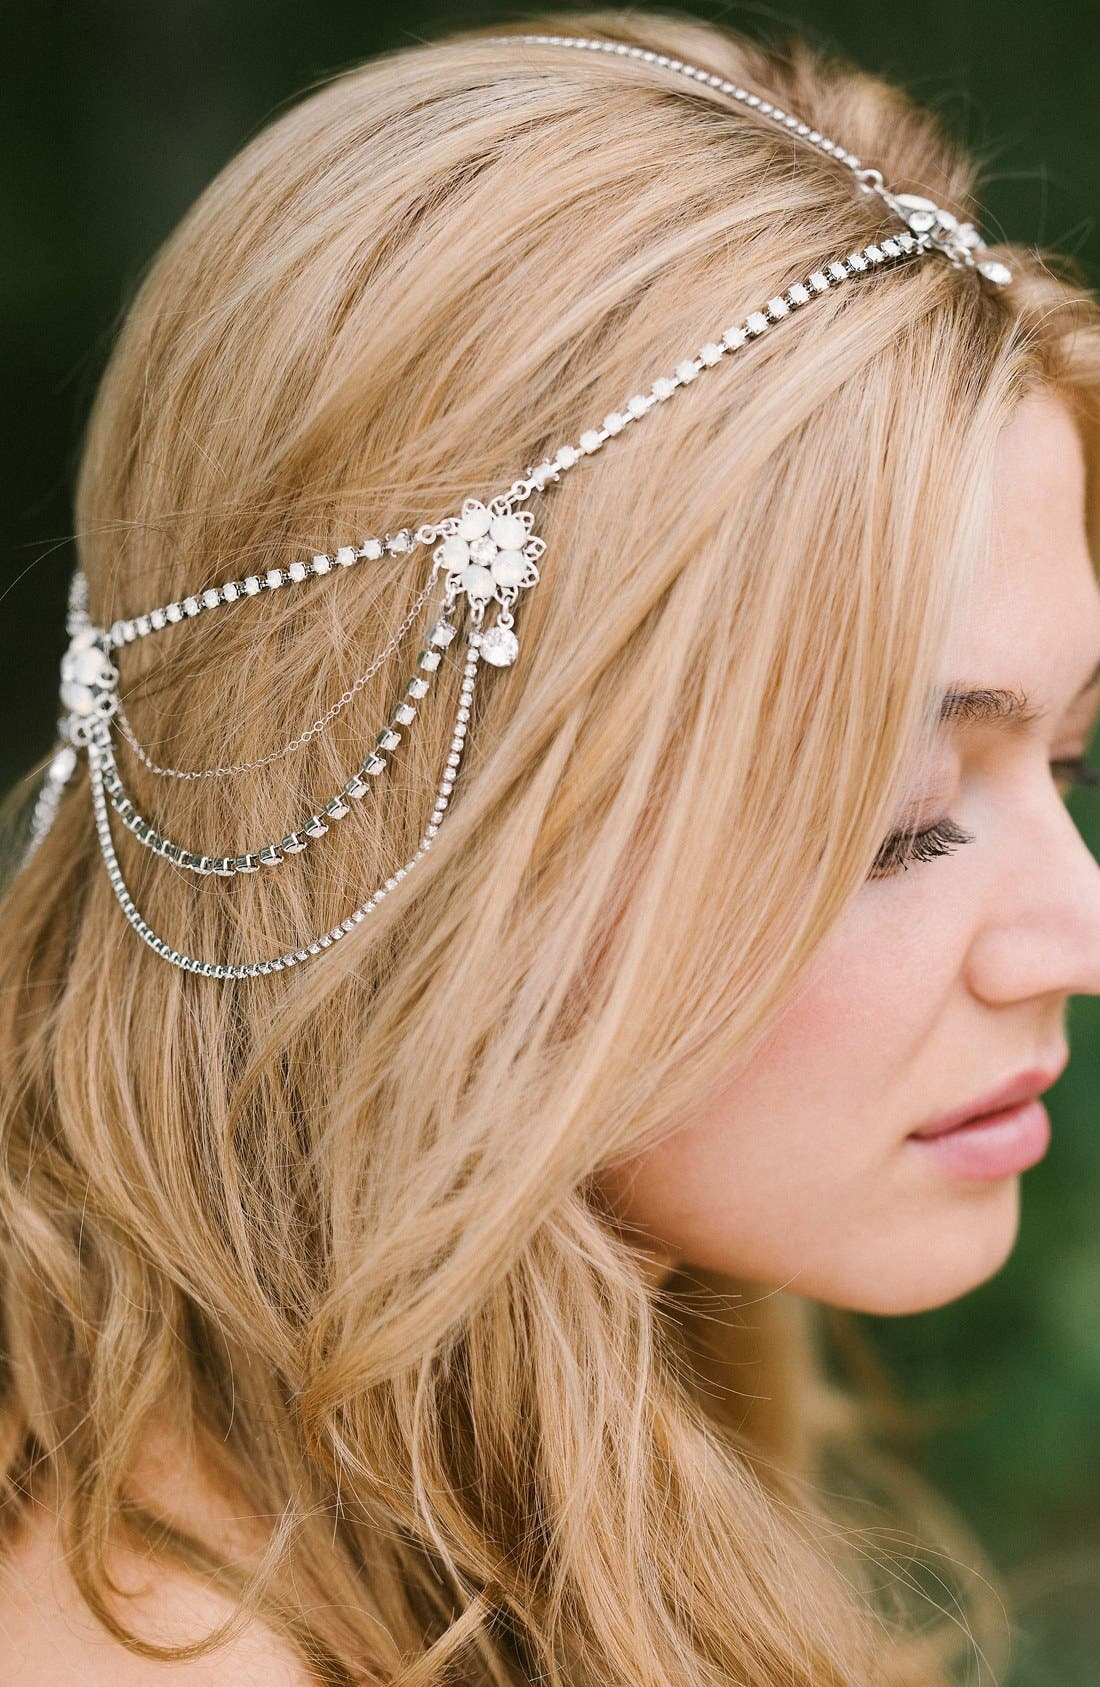 Sara Gabriel 'Madeline' Floral Crystal Hair Chain